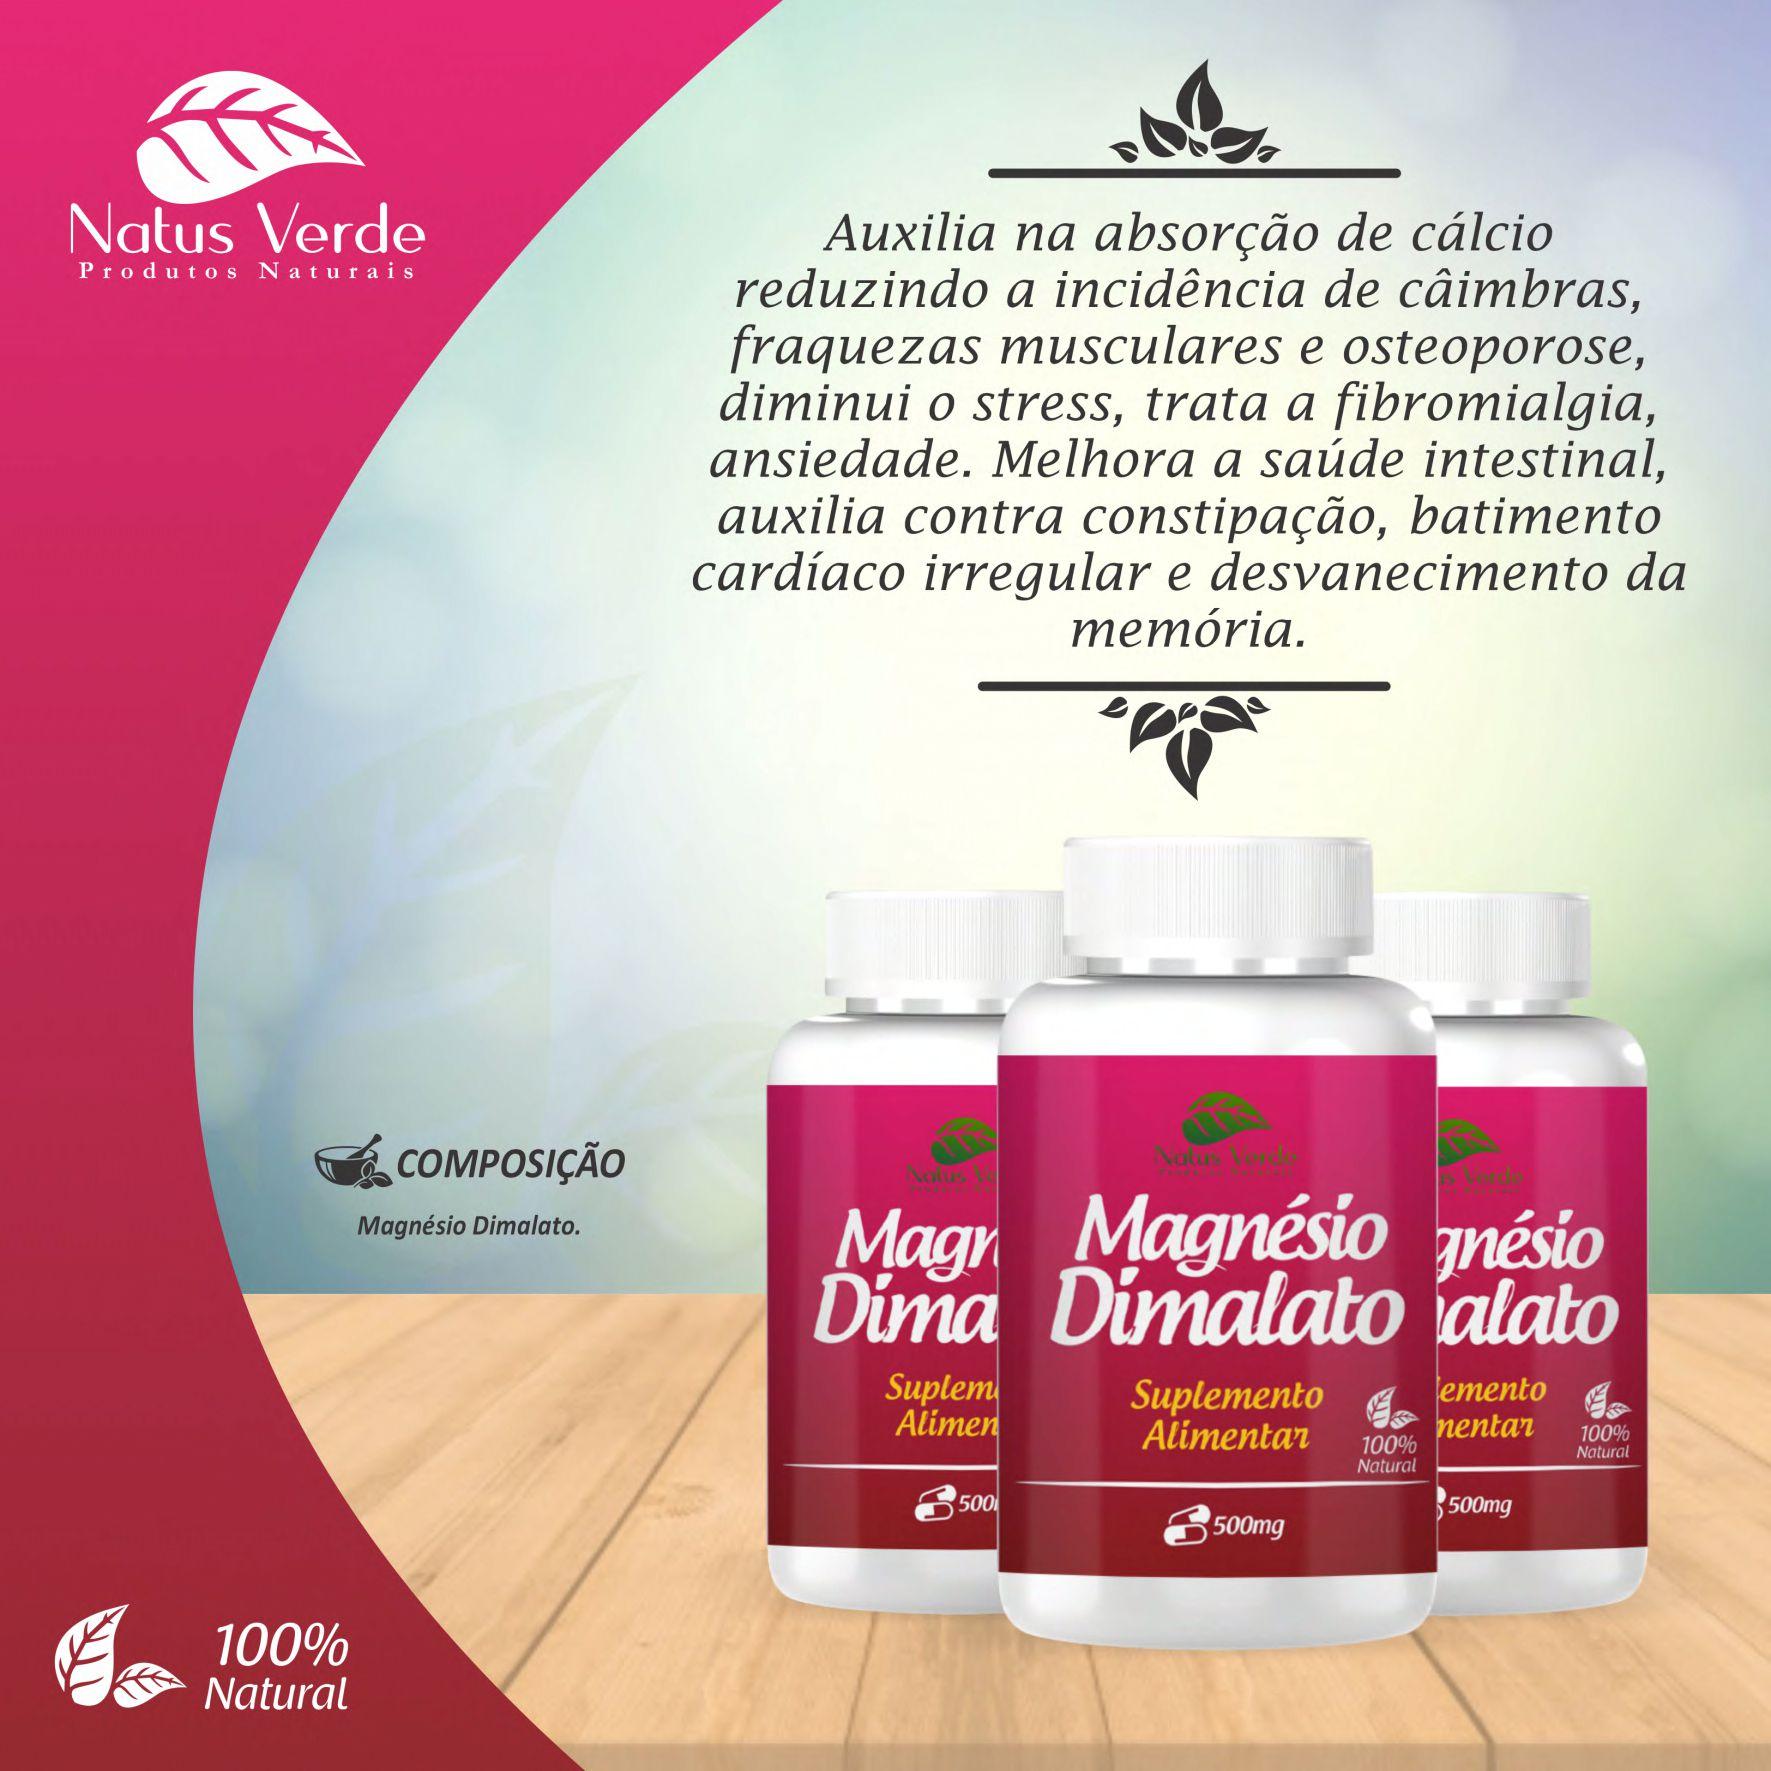 Magnésio Dimalato Suplemento Alimentar Natus Verde  - Fribasex - Fabricasex.com